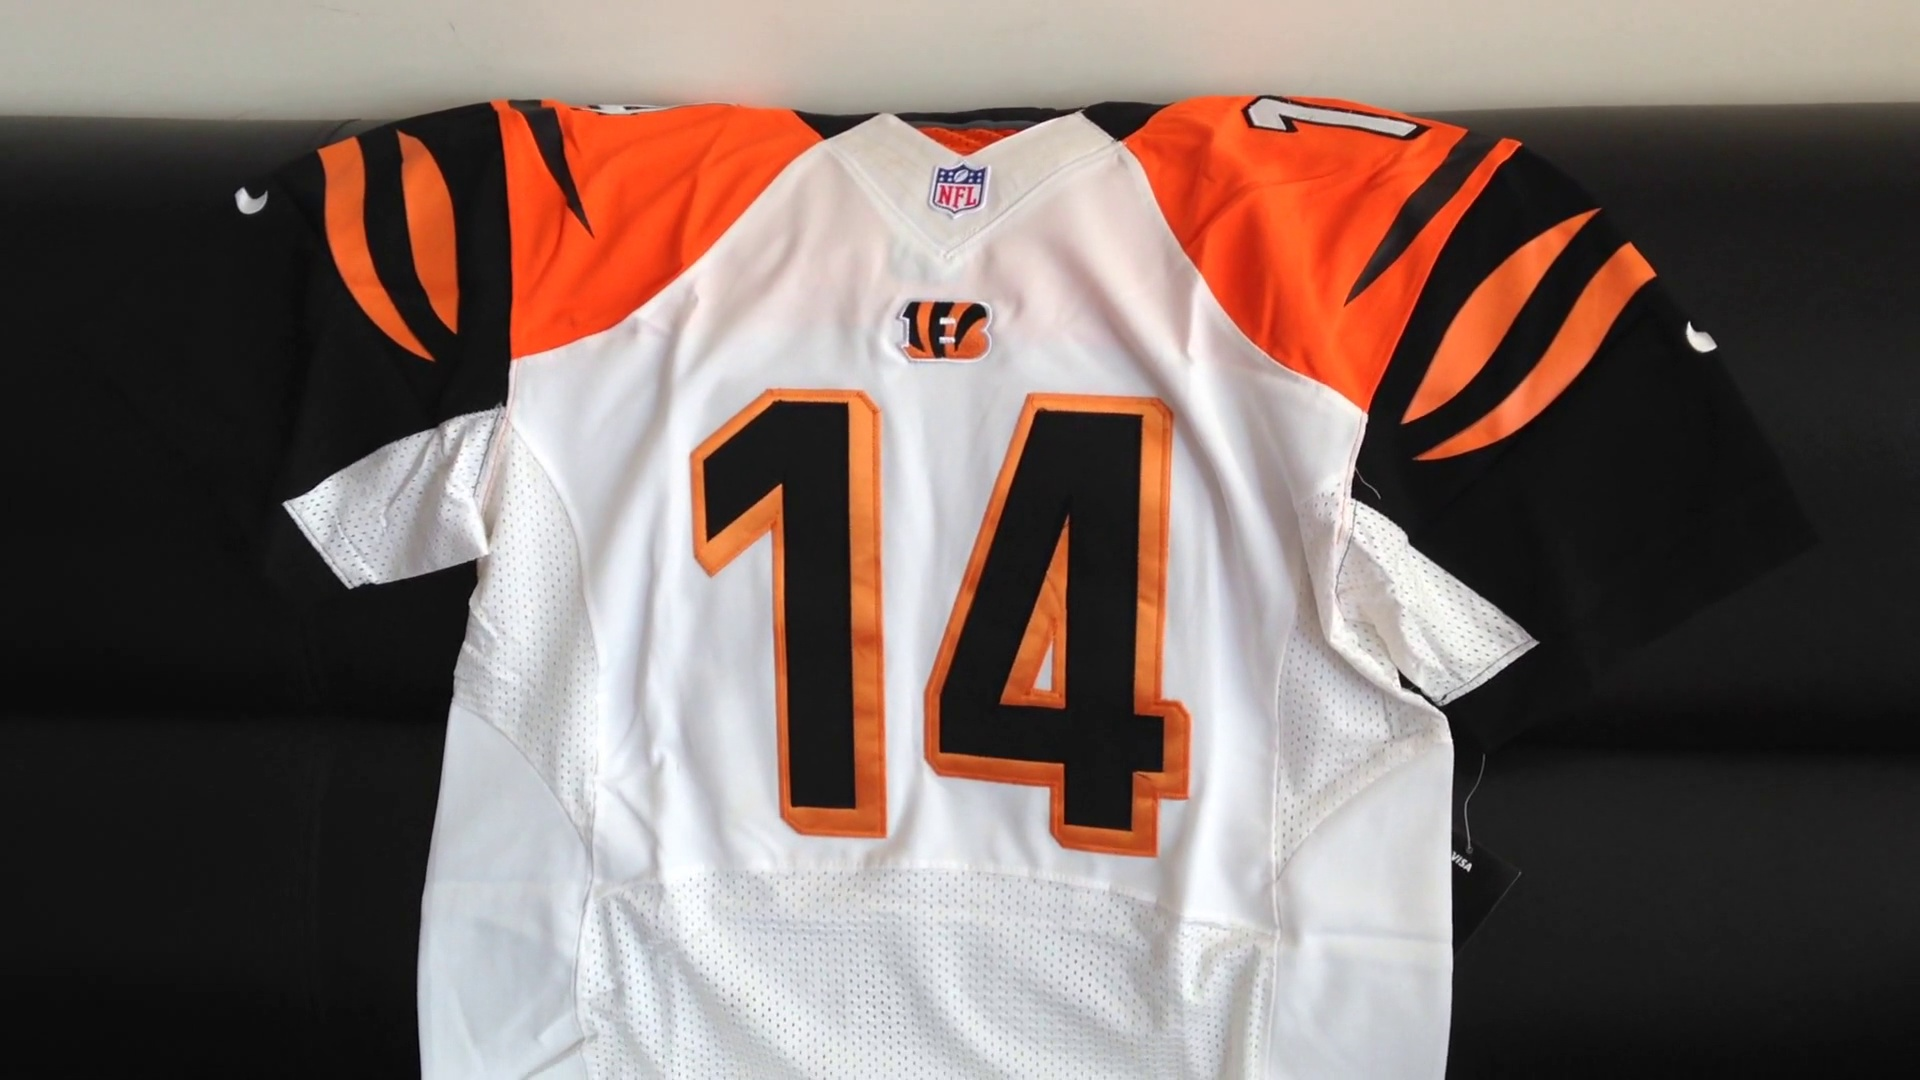 2014 Cincinnati Bengals Nike NFL Jerseys Dalton 14 Black Jerseys From jerseys-china.cn